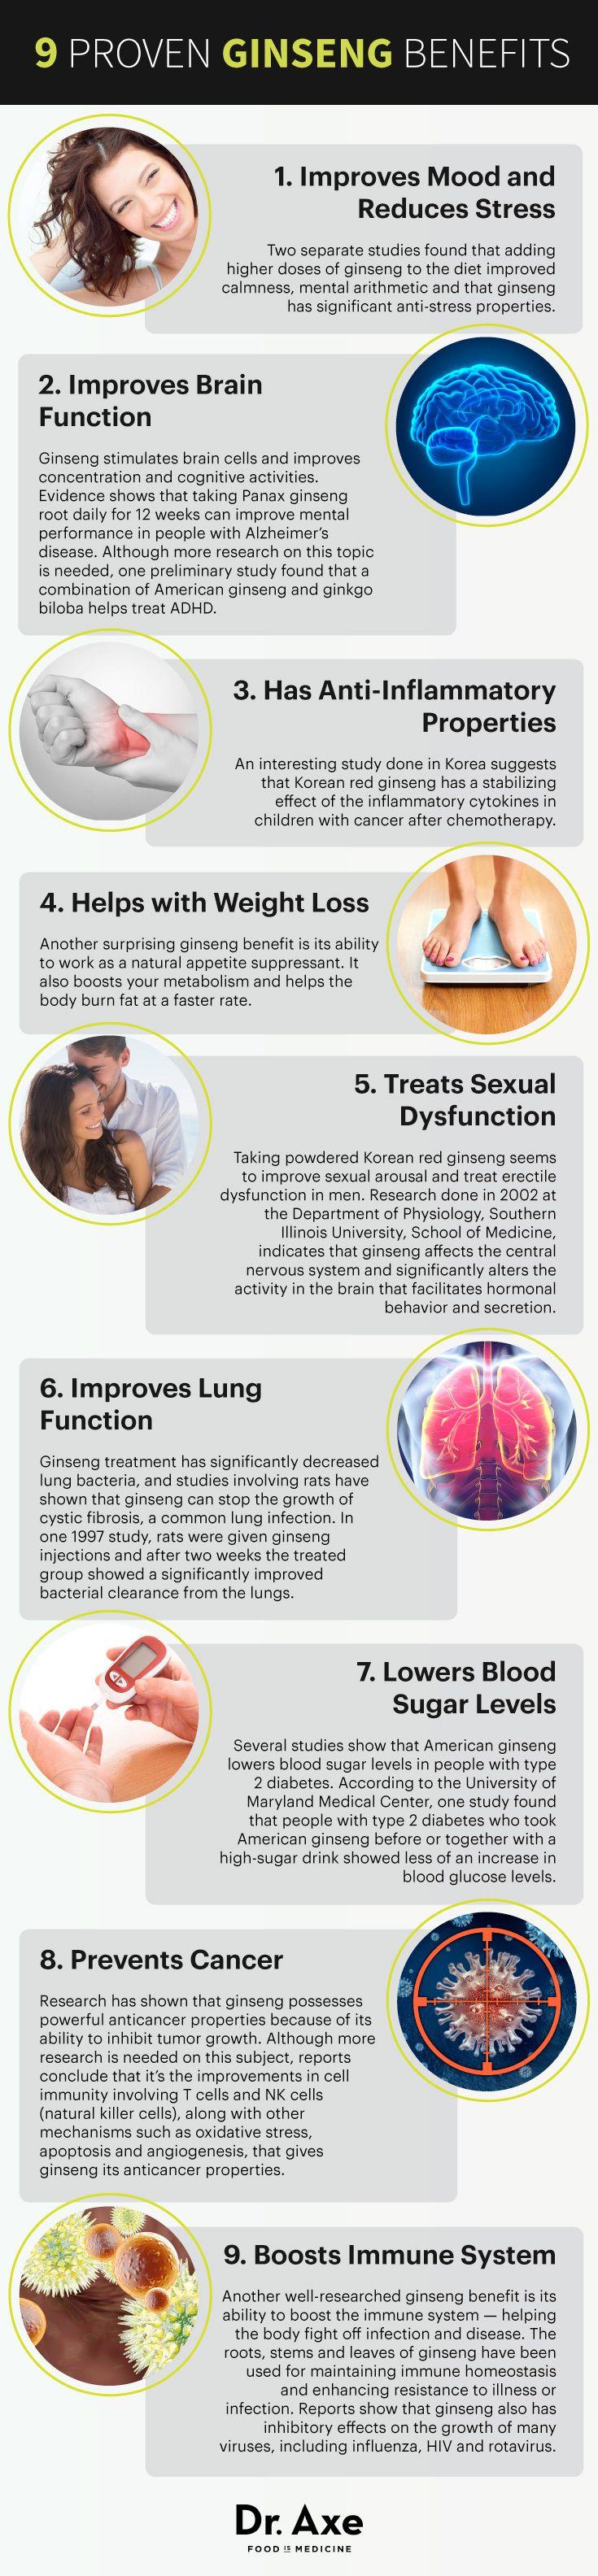 9 ginseng benefits - Dr. Axe http://www.draxe.com #health #holistic #natural